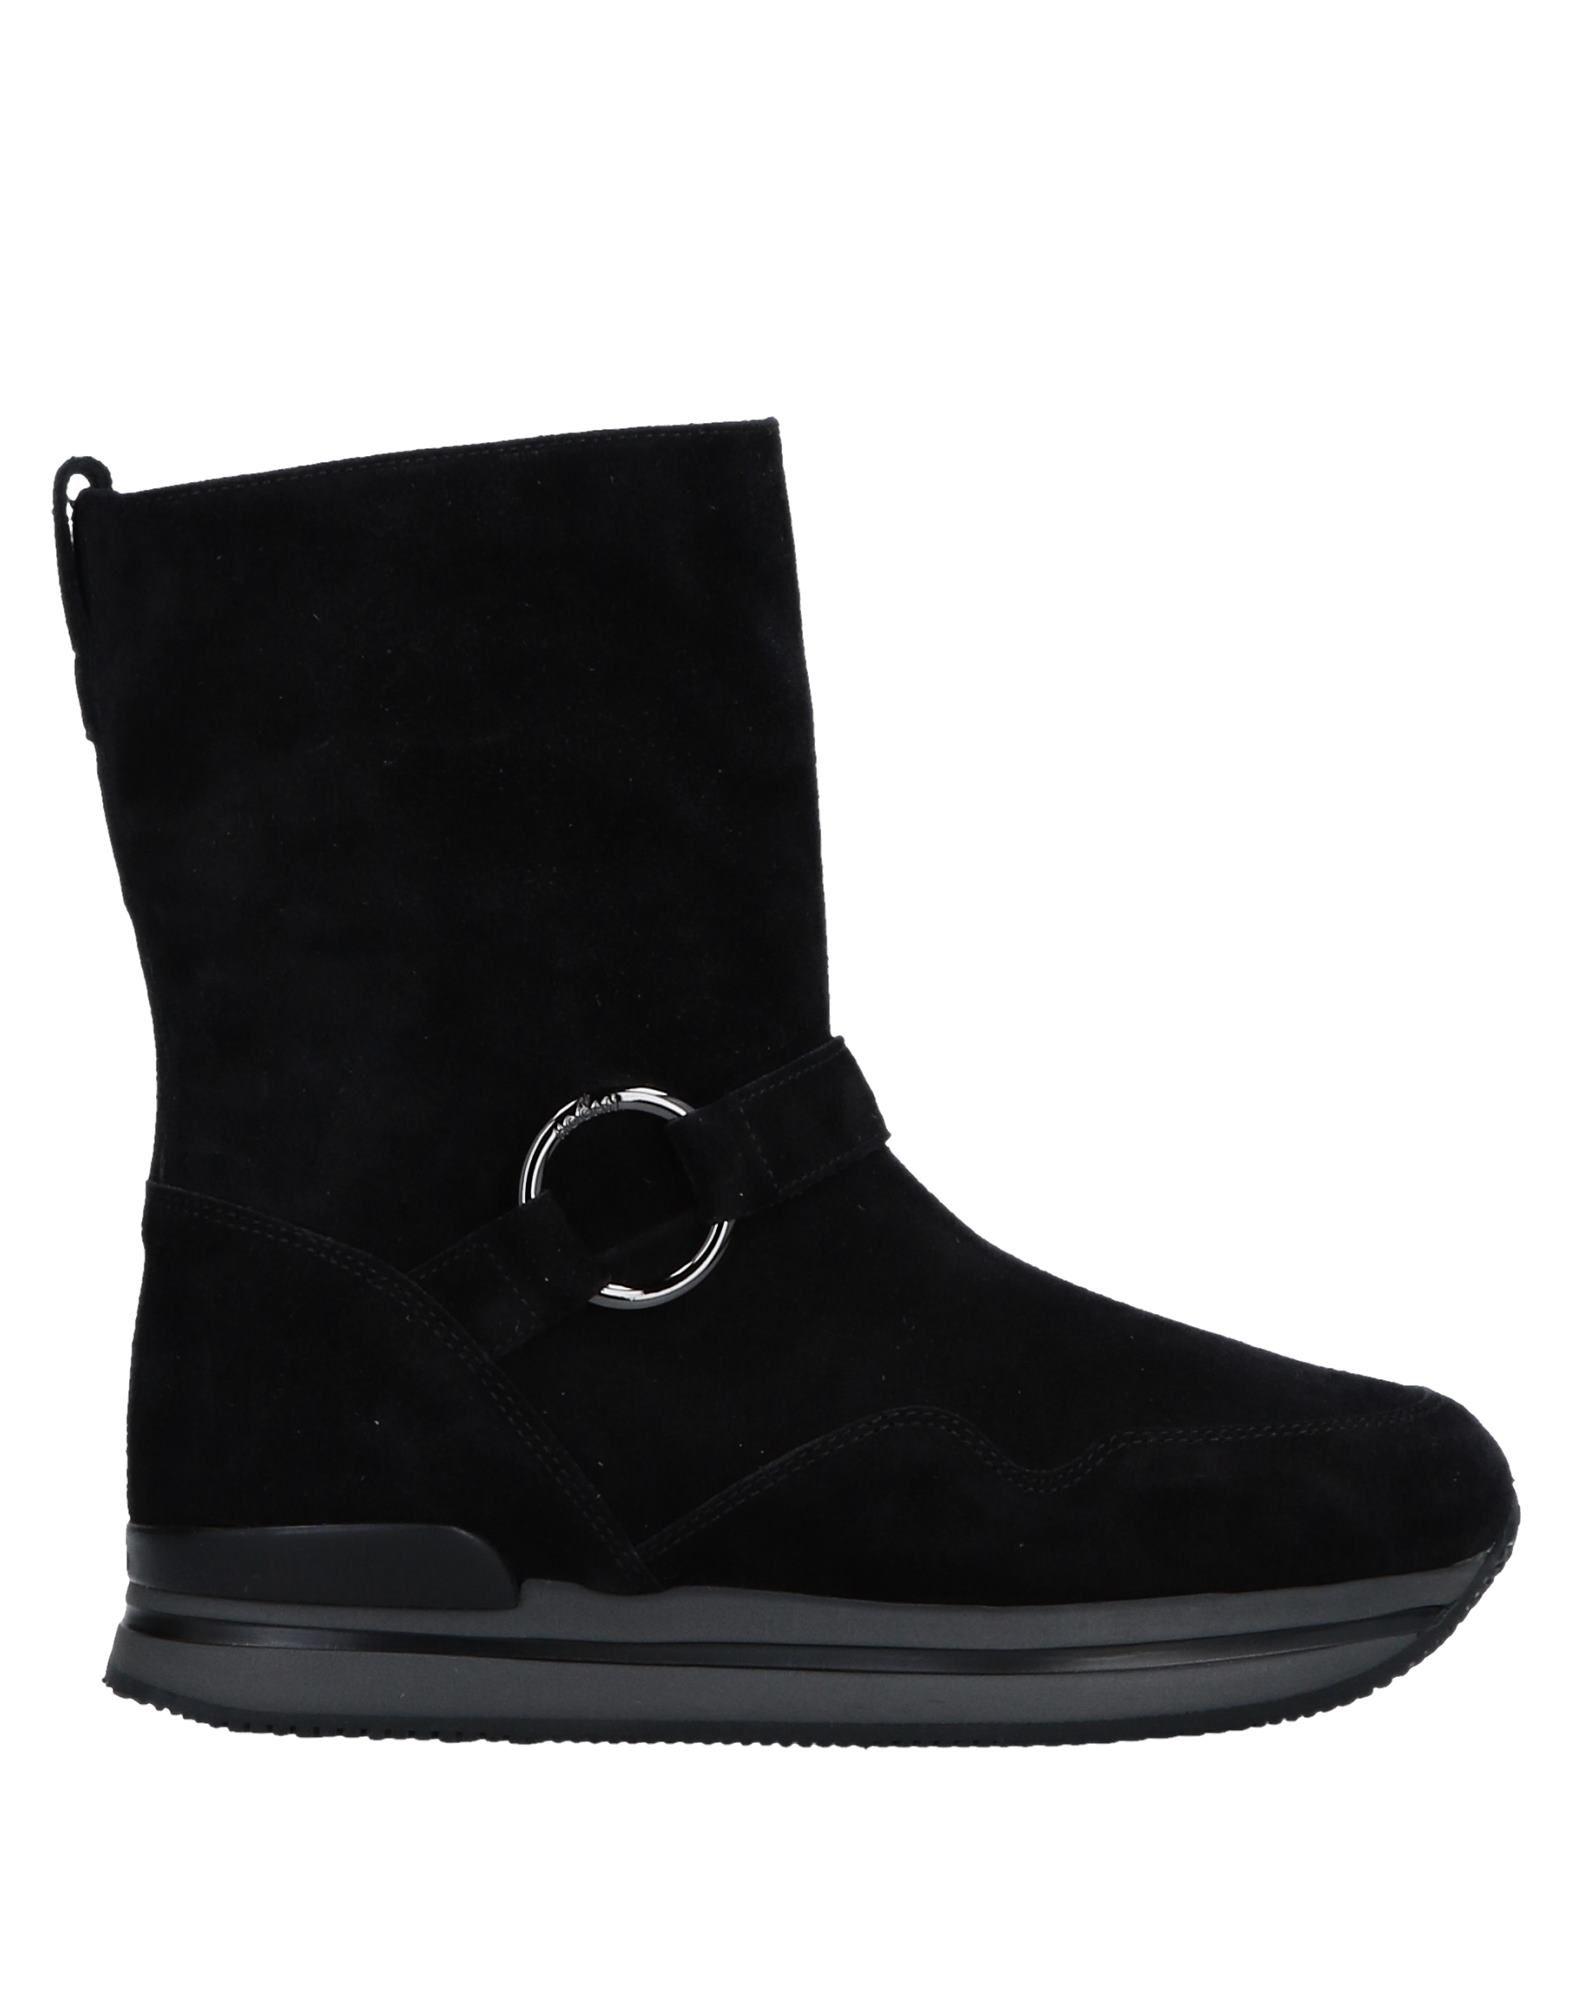 Rabatt Schuhe Stiefelette Hogan Stiefelette Schuhe Damen  11539998DB 095d30